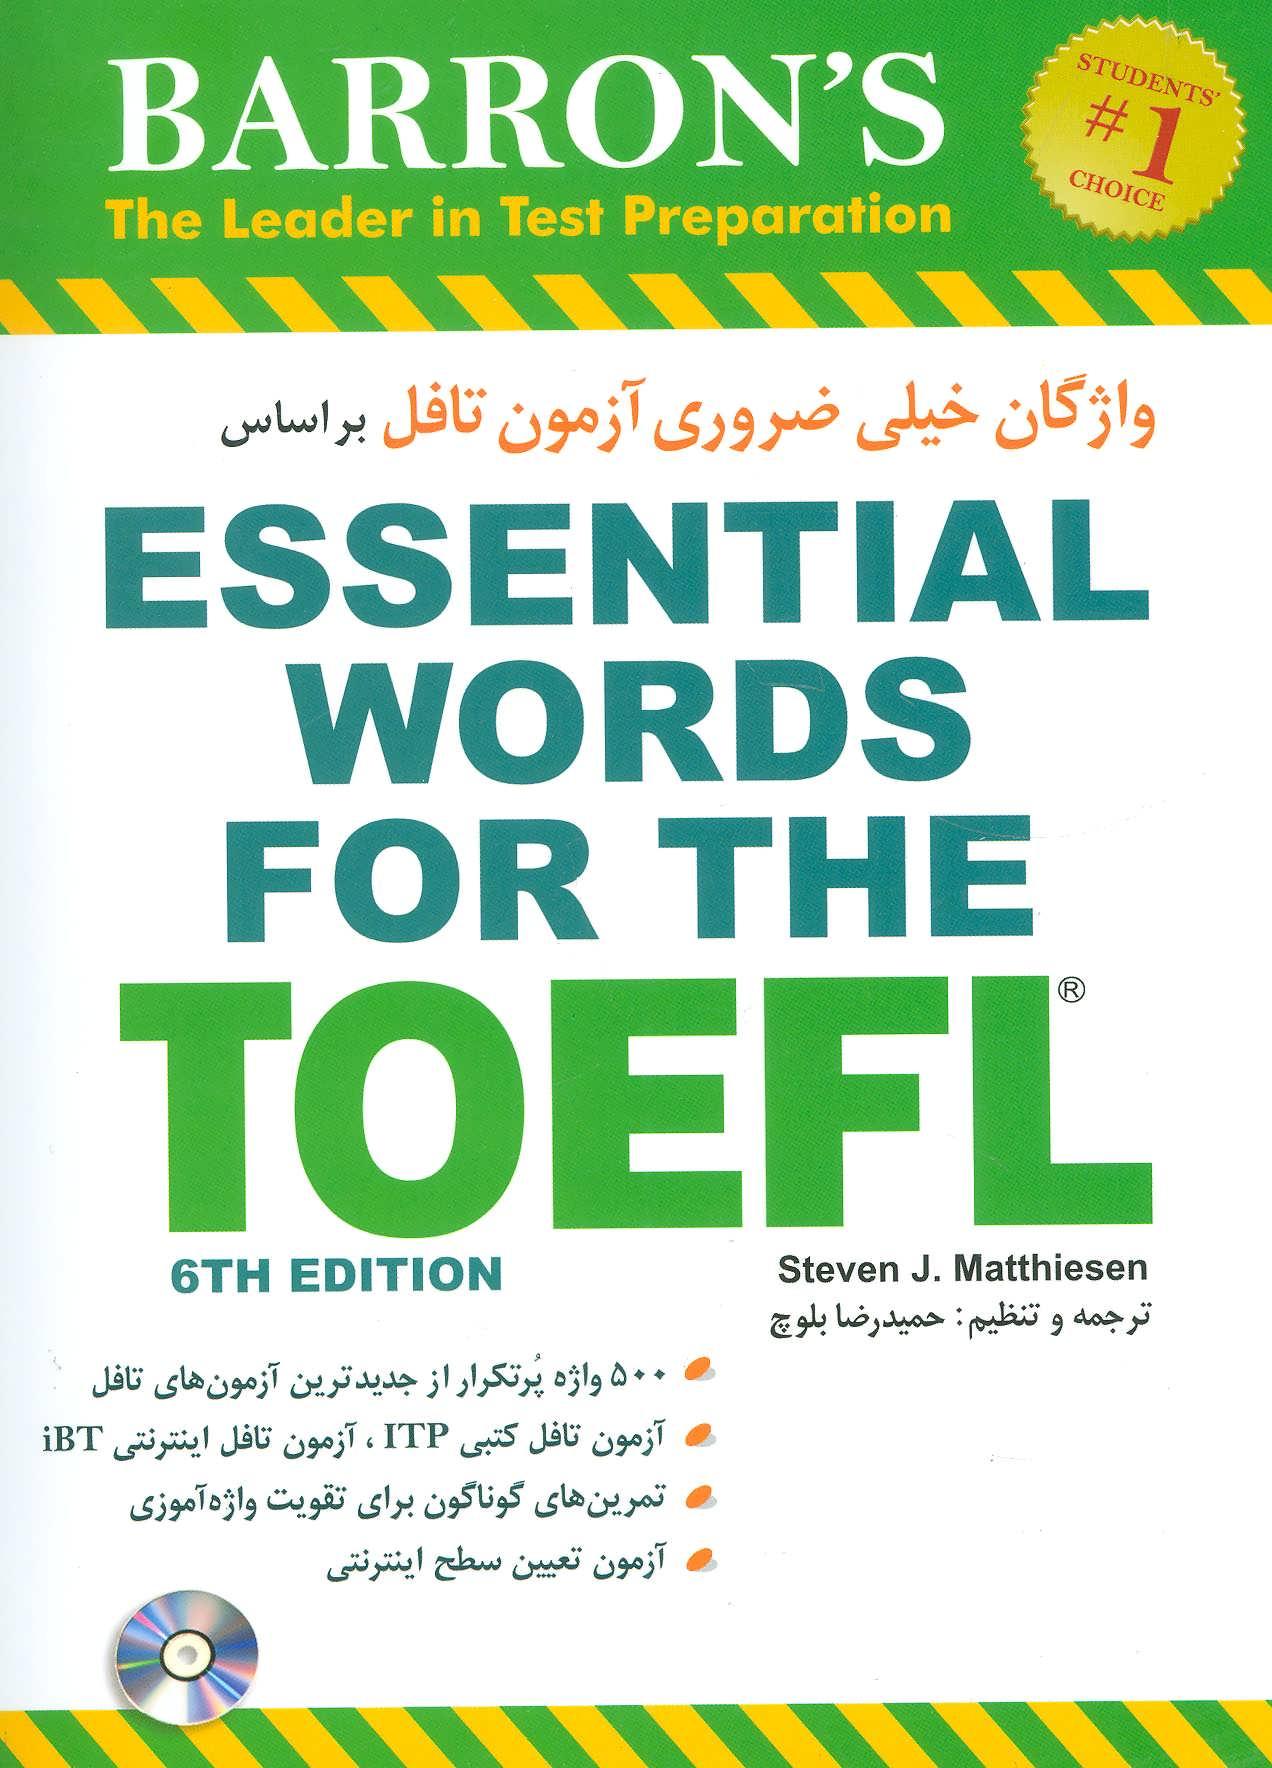 واژگان خیلی ضروری آزمون تافل بر اساس ESSENTIAL WORDS FOR THE TOEFL